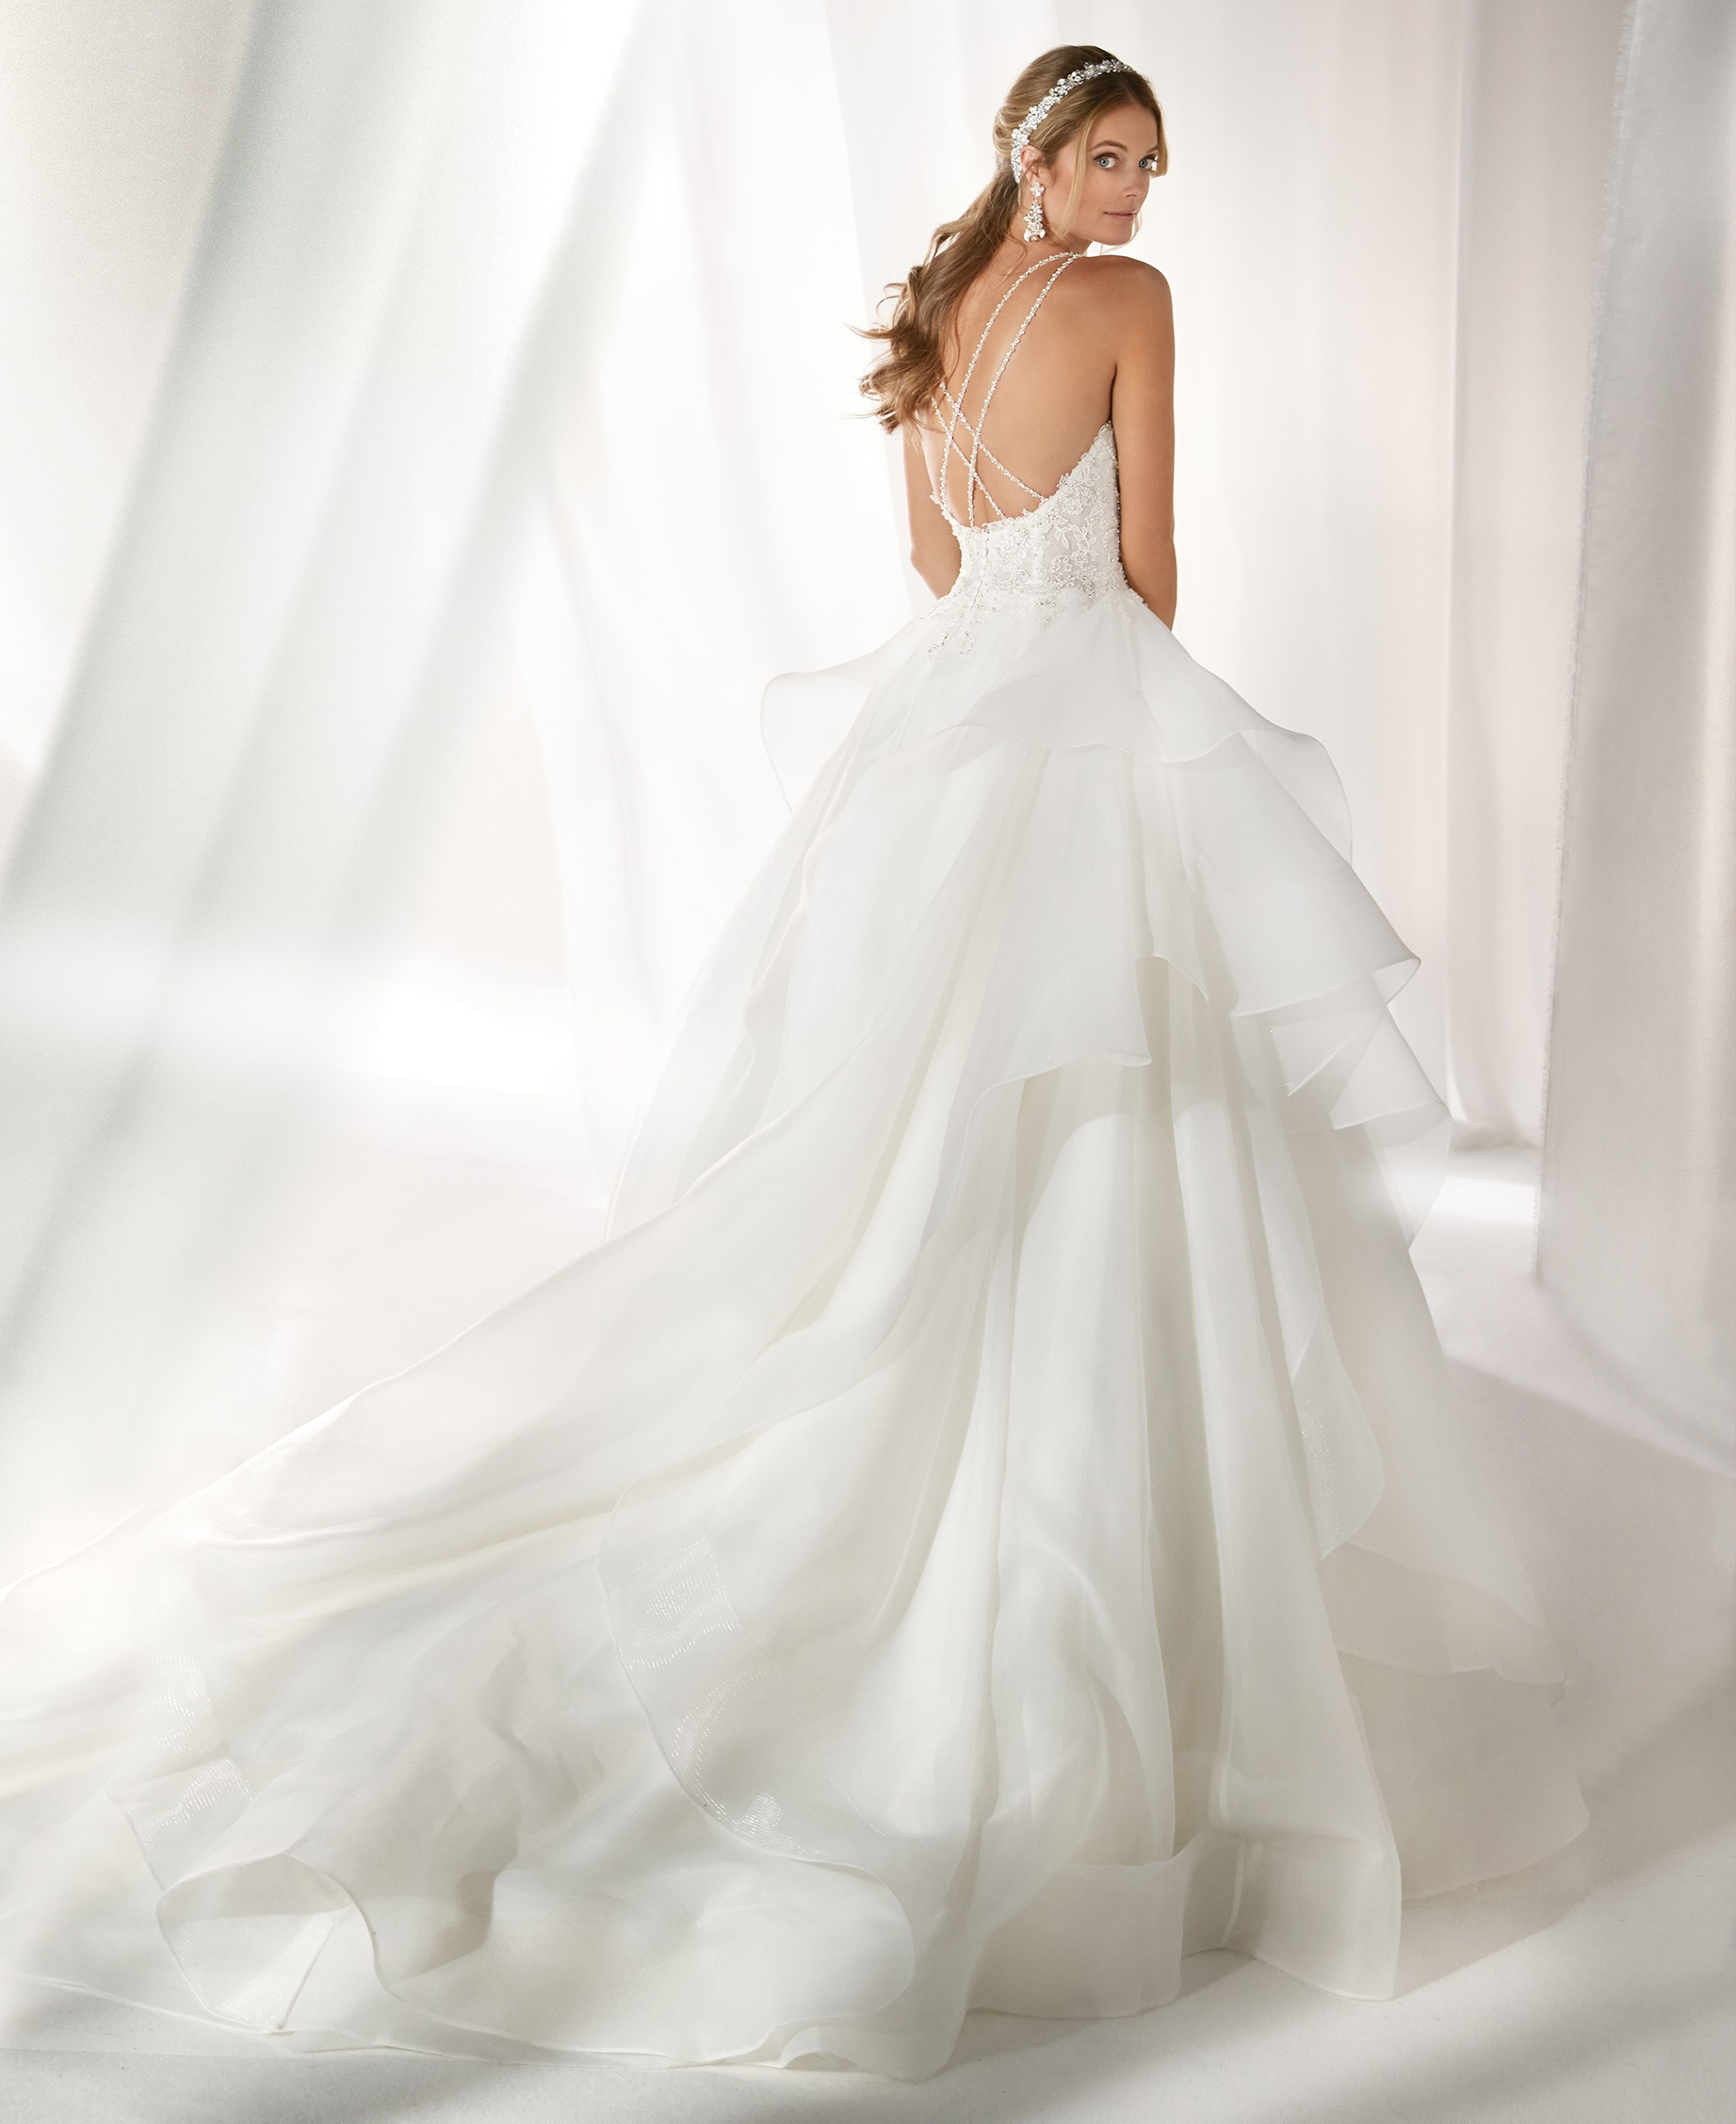 nicole-spose-NIAB19137-Nicole-moda-sposa-2019-962